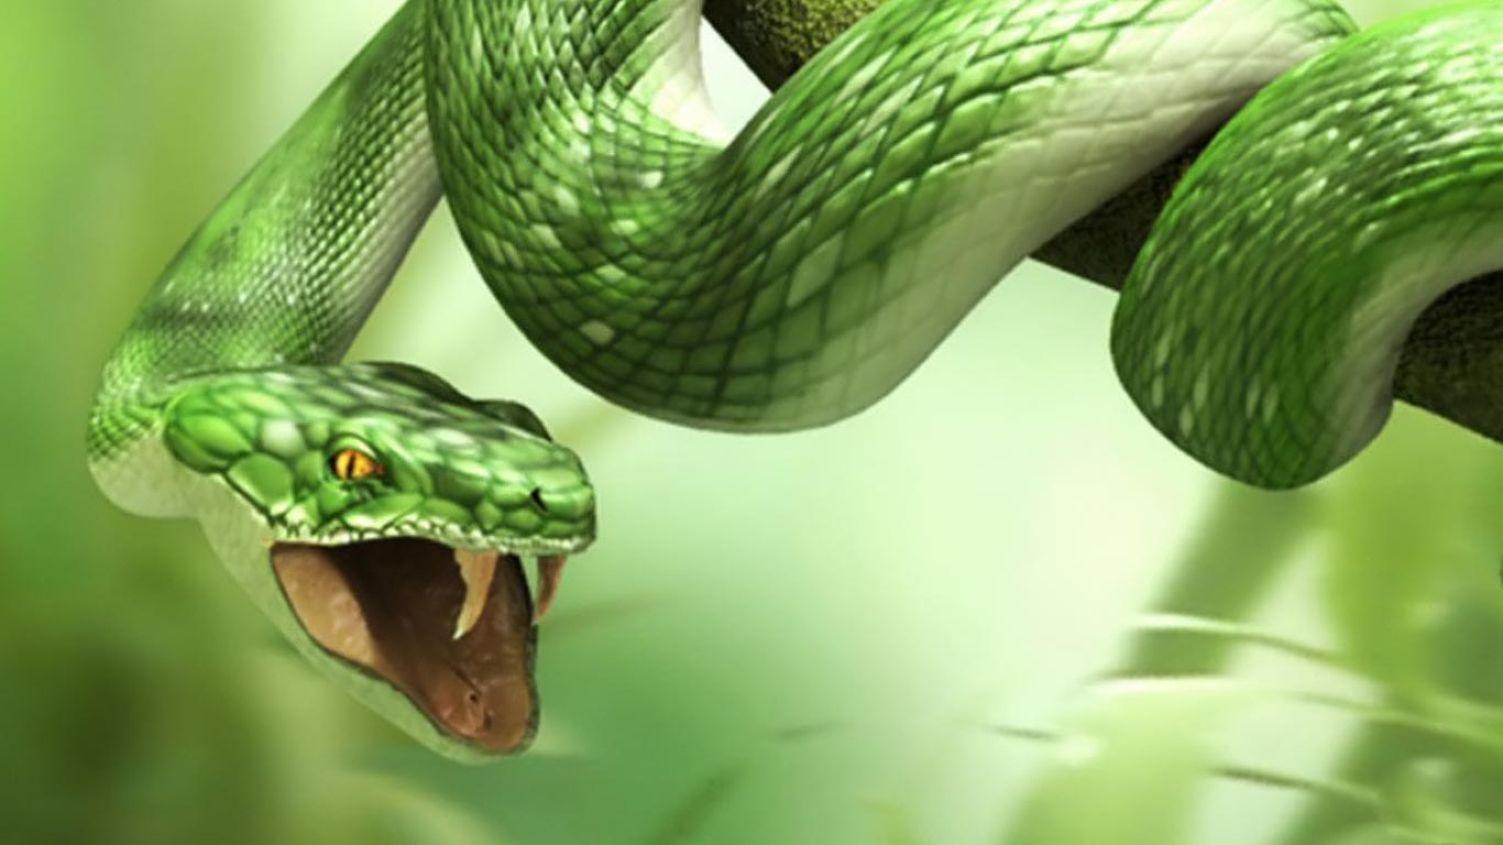 3D Snake HD for Laptop 1366x768 Wallpaper: Desktop HD Wallpaper